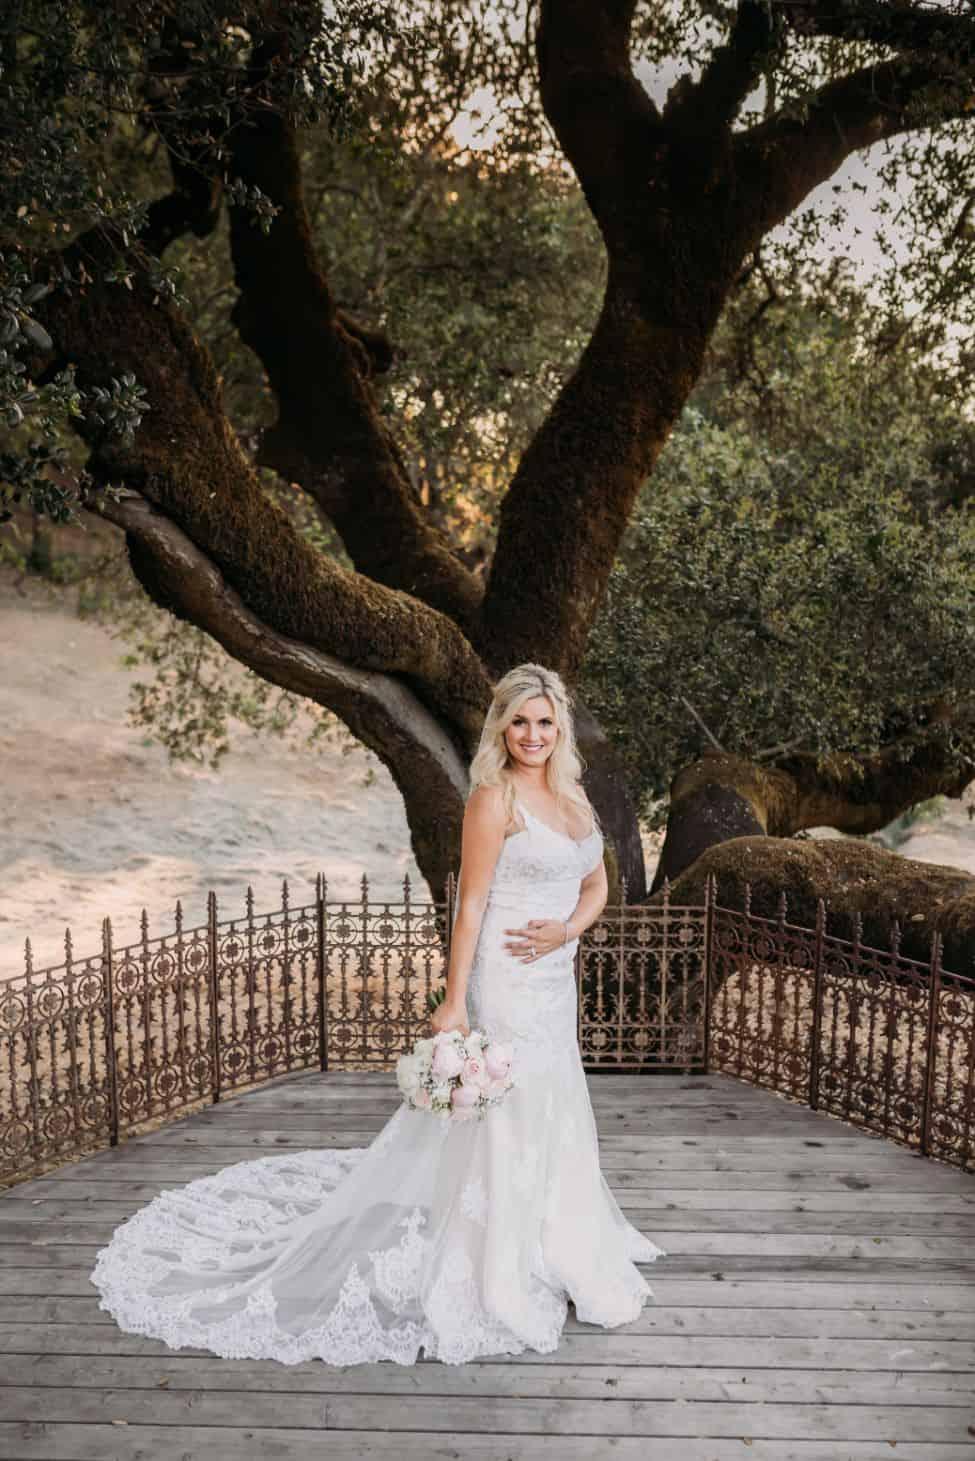 9 photo opportunities rustic mountain house estate weddingi venues northern california